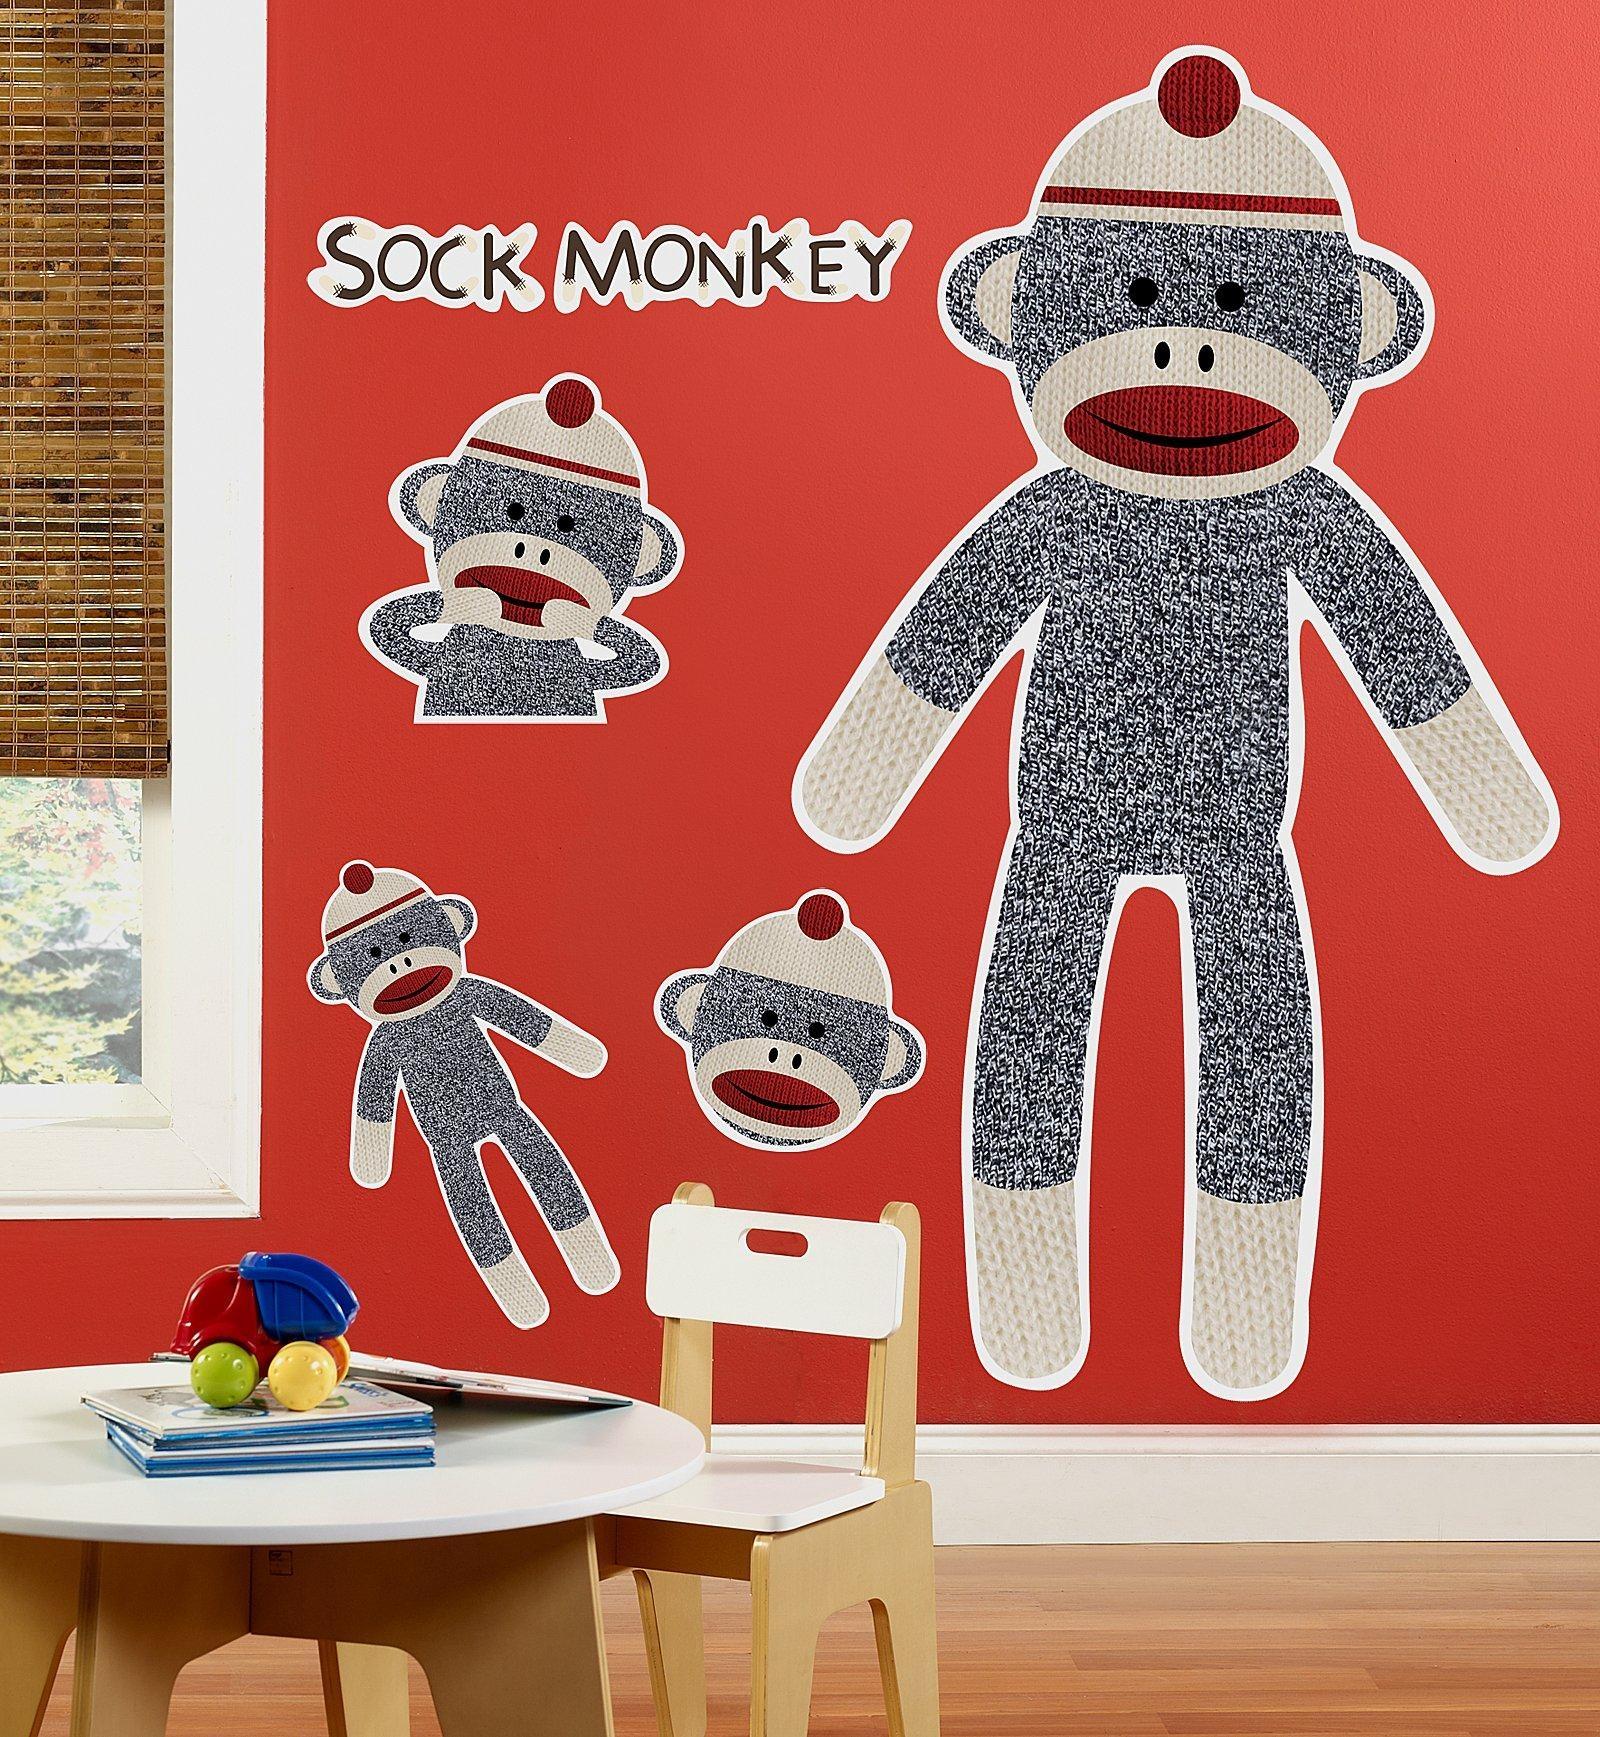 Sock Monkey Red – Personalized Vinyl Banner | Birthdayexpress Pertaining To Sock Monkey Wall Art (View 7 of 20)